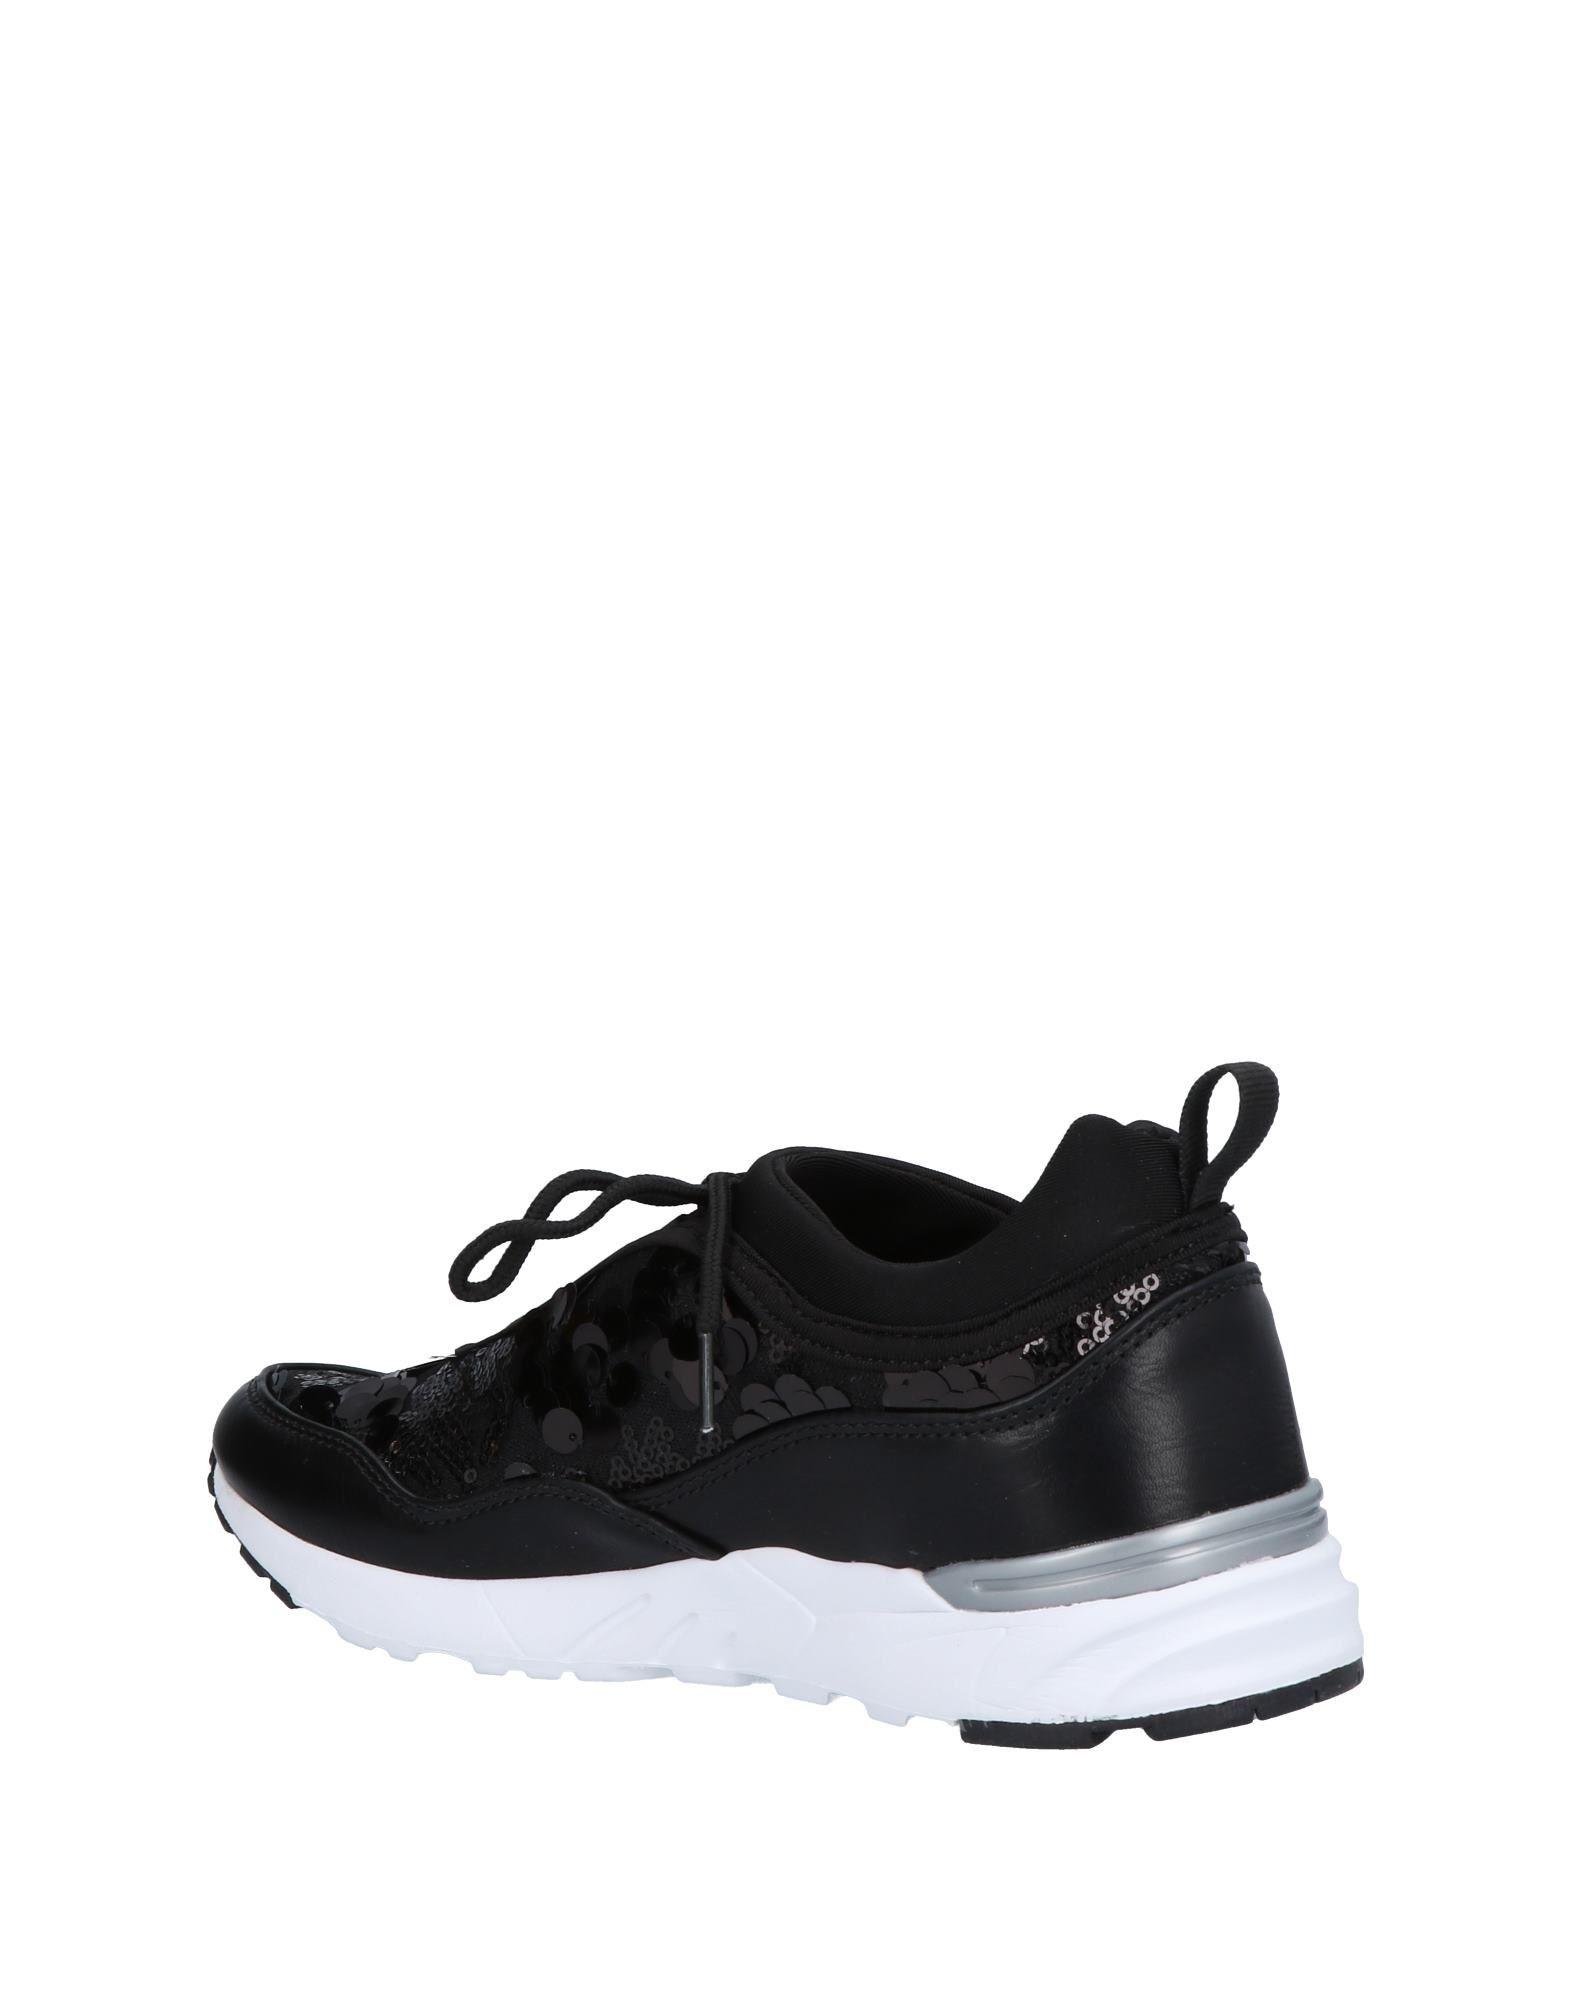 Noa 11457915VE Harmon Sneakers Damen  11457915VE Noa Gute Qualität beliebte Schuhe 58cefd